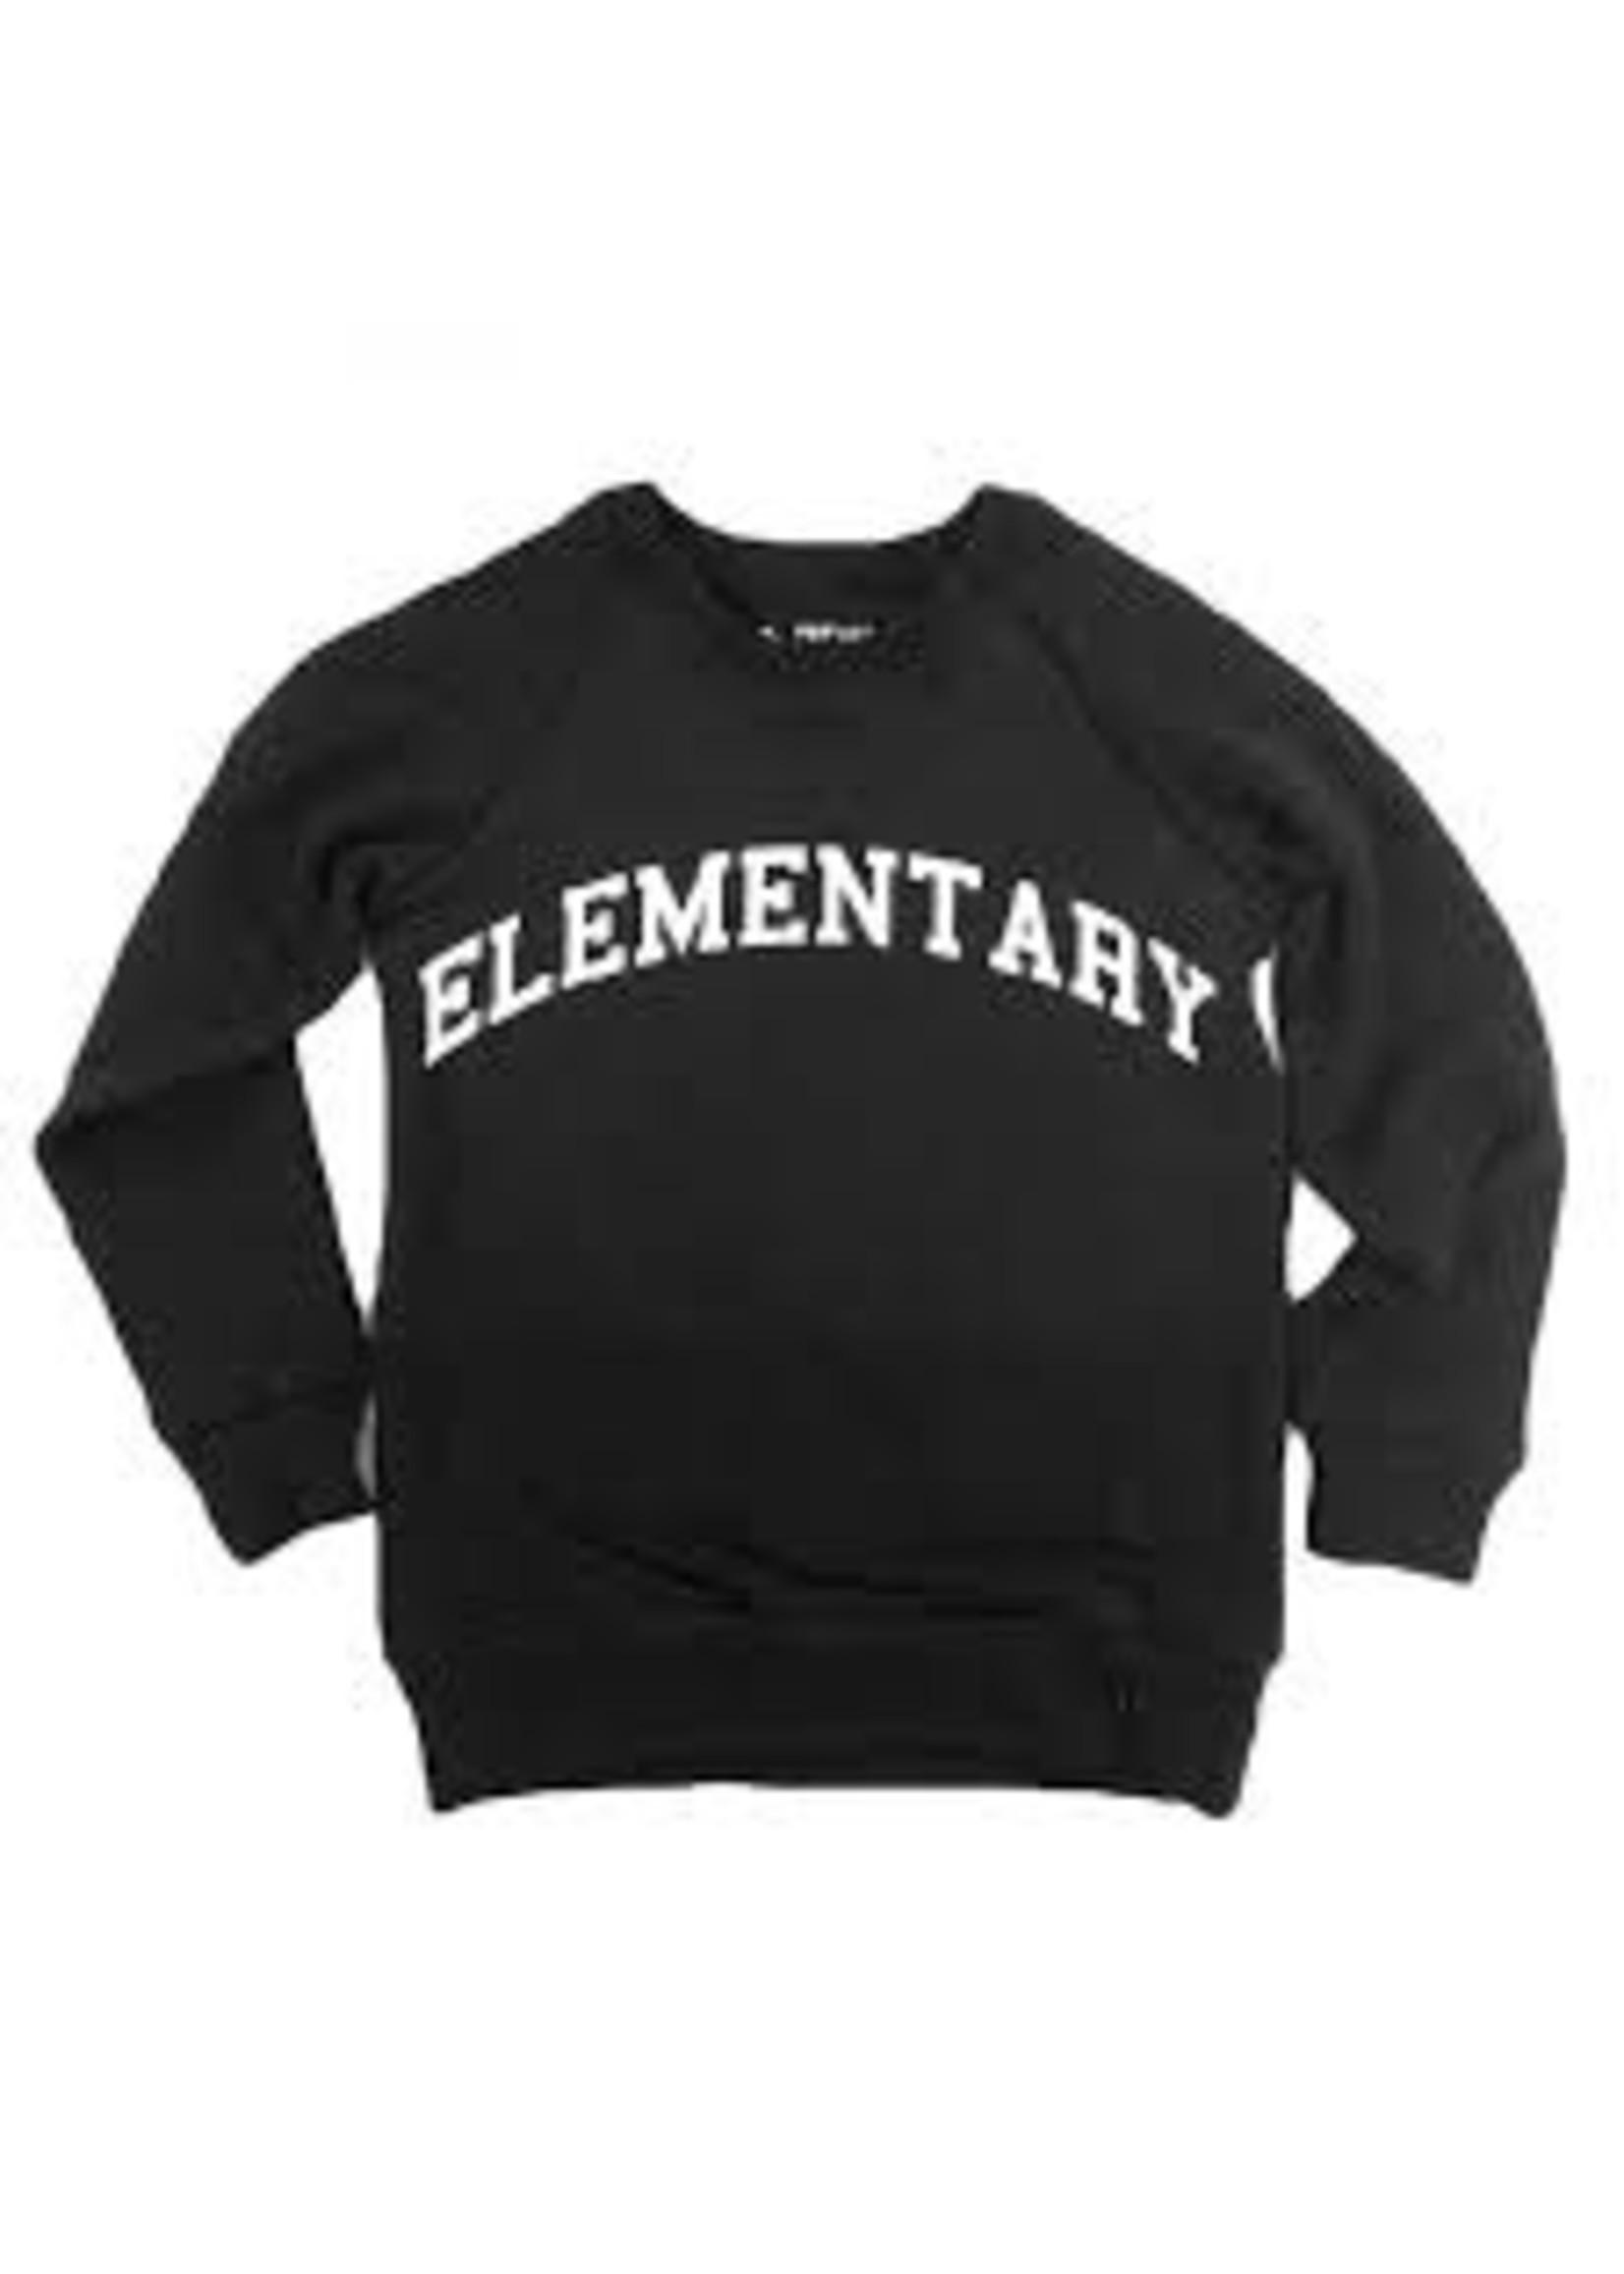 Portage & Main PM sweater